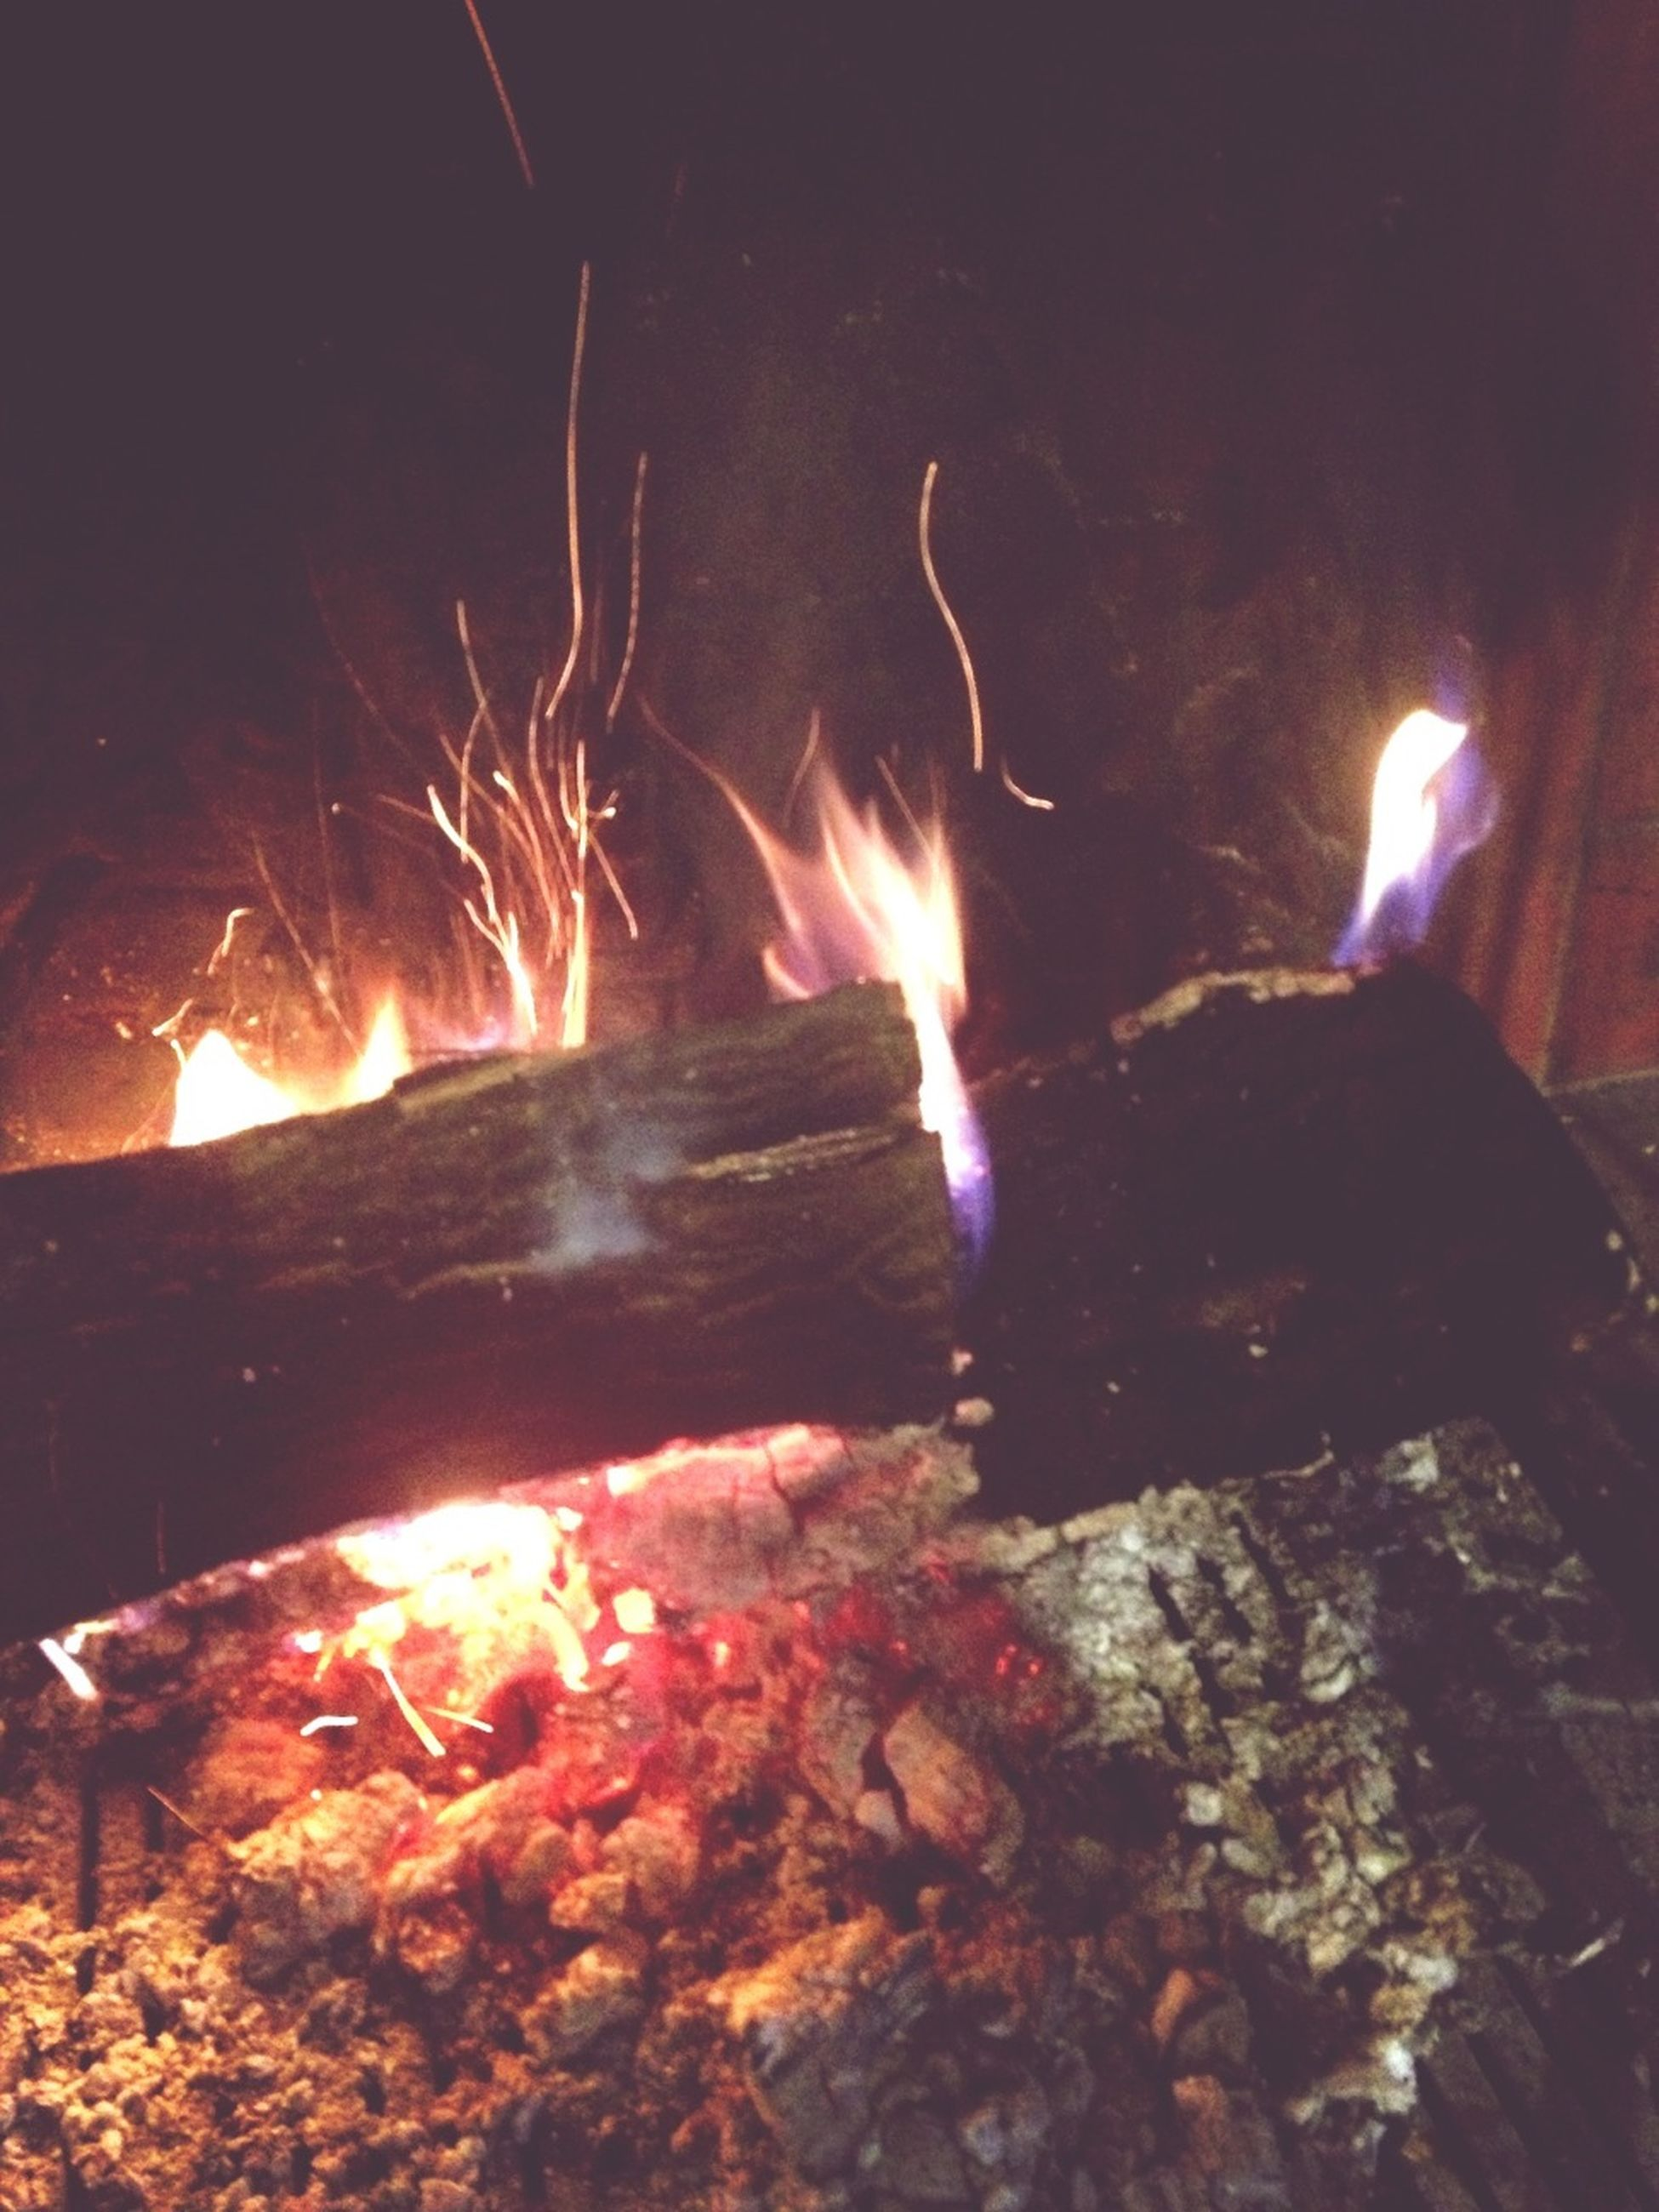 burning, fire - natural phenomenon, flame, night, heat - temperature, glowing, bonfire, motion, fire, illuminated, long exposure, campfire, firewood, heat, outdoors, light - natural phenomenon, dark, orange color, no people, close-up